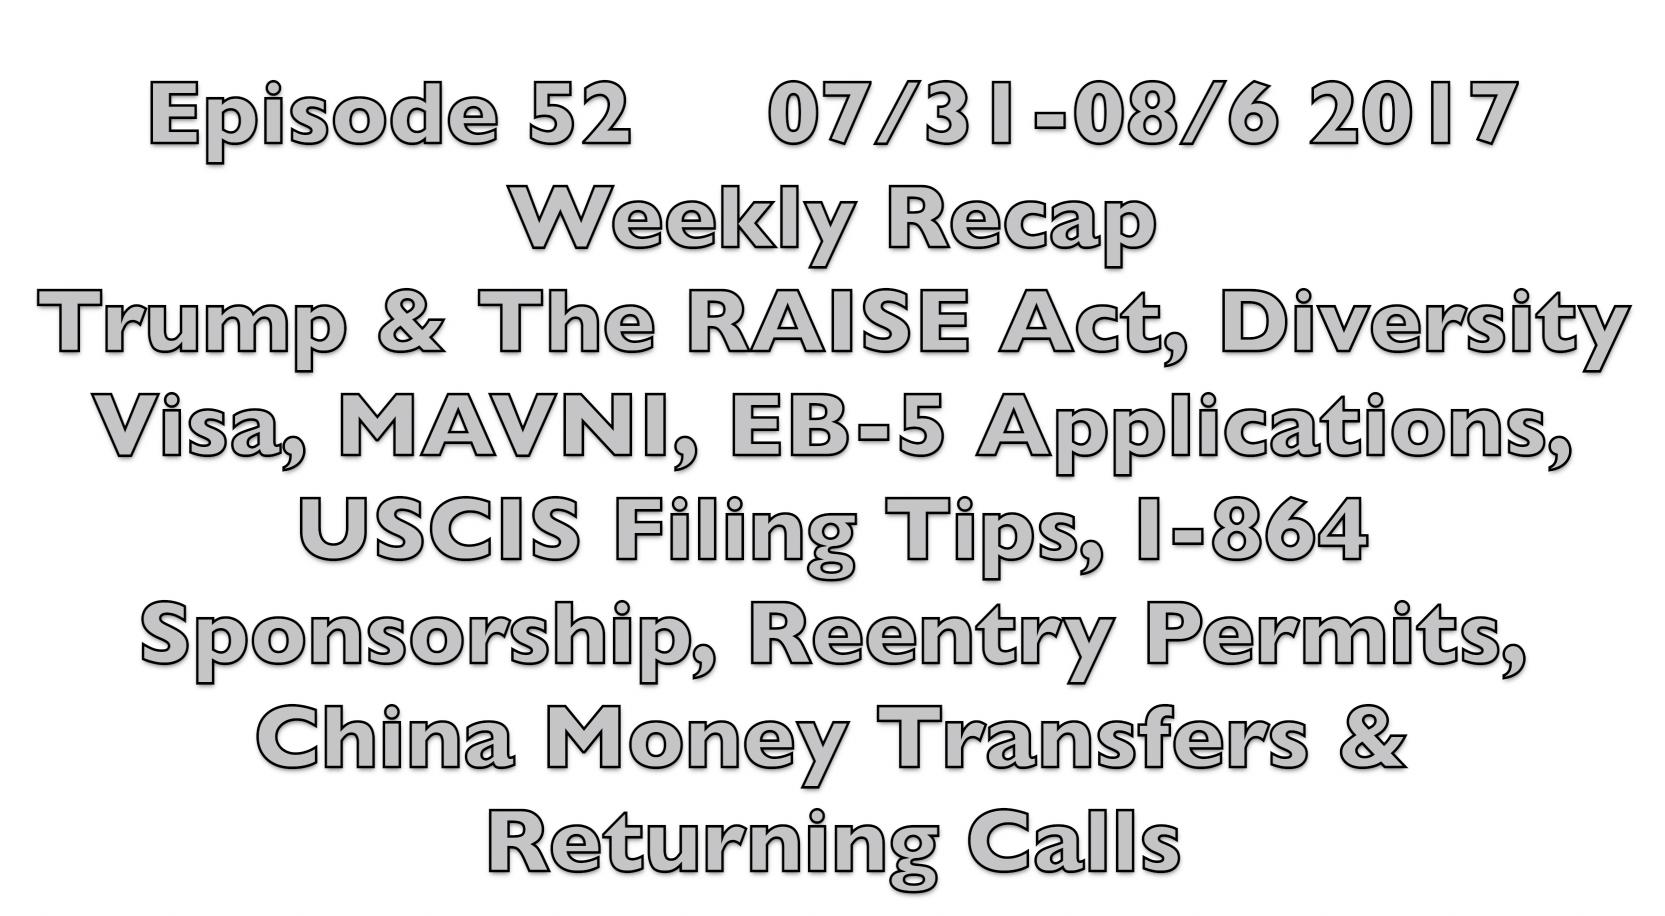 Episode 52 - Trump & The RAISE Act, Diversity Visa, MAVNI